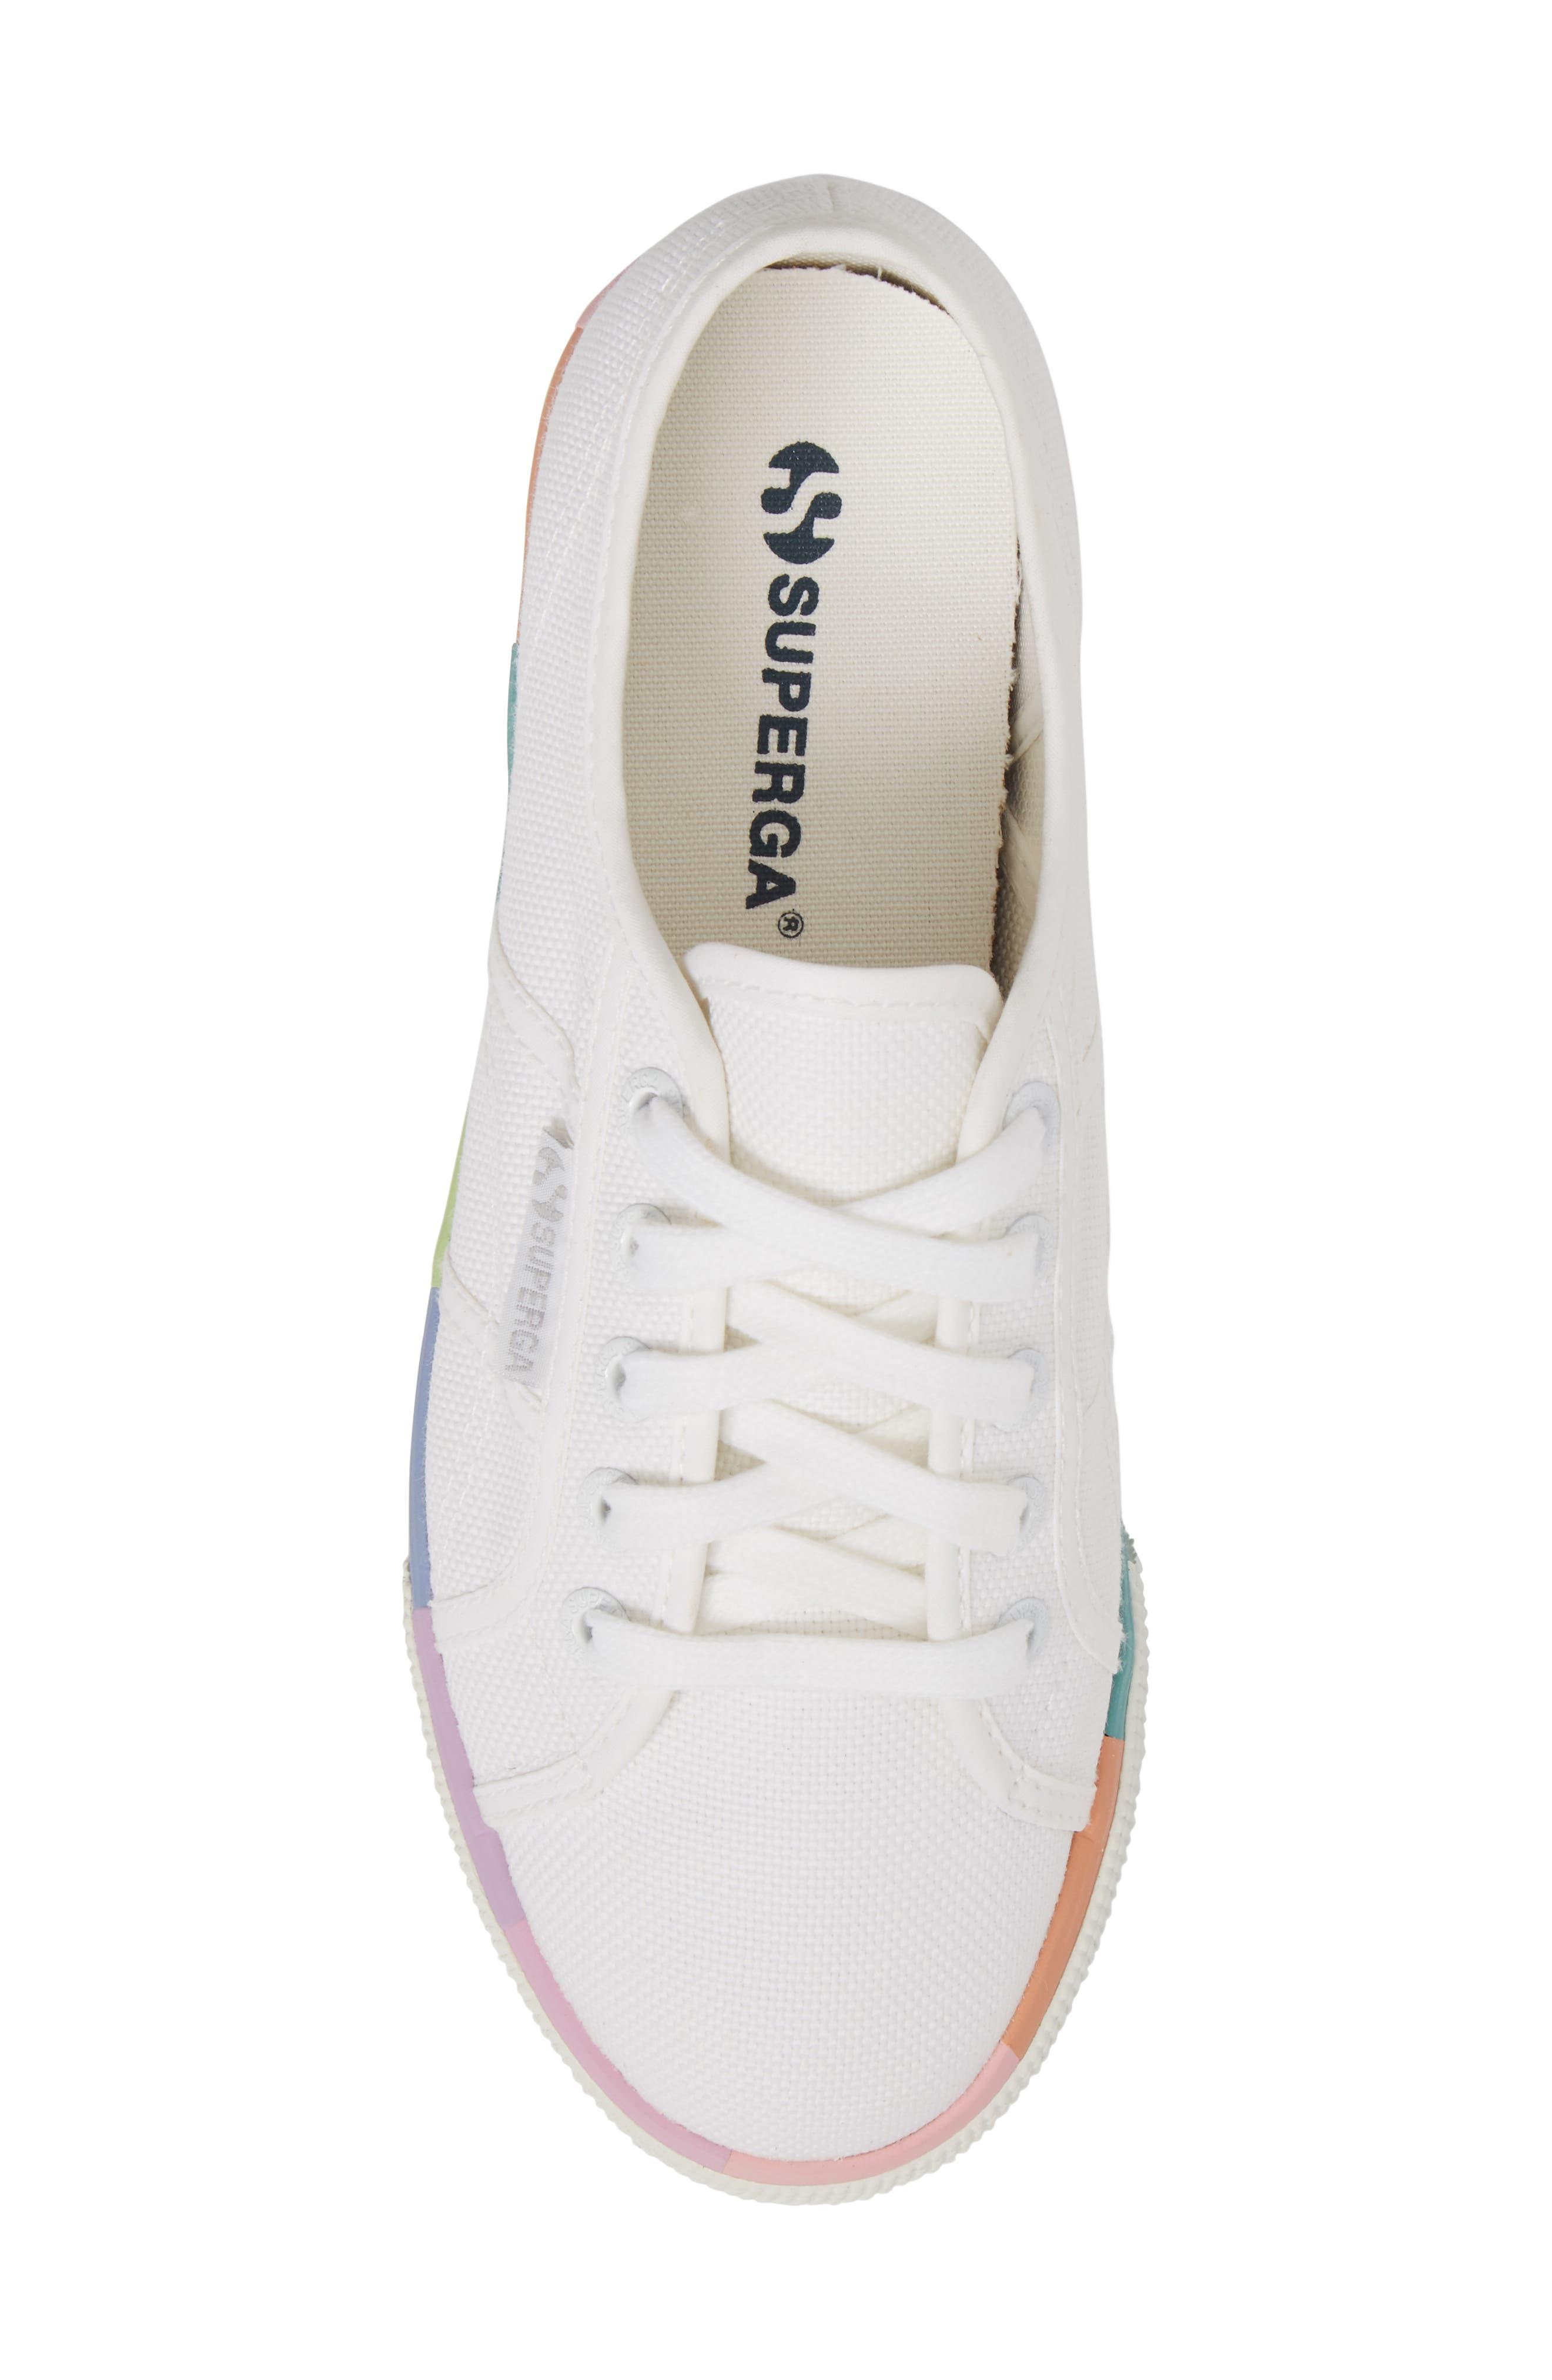 2790 Platform Sneaker,                             Alternate thumbnail 5, color,                             100